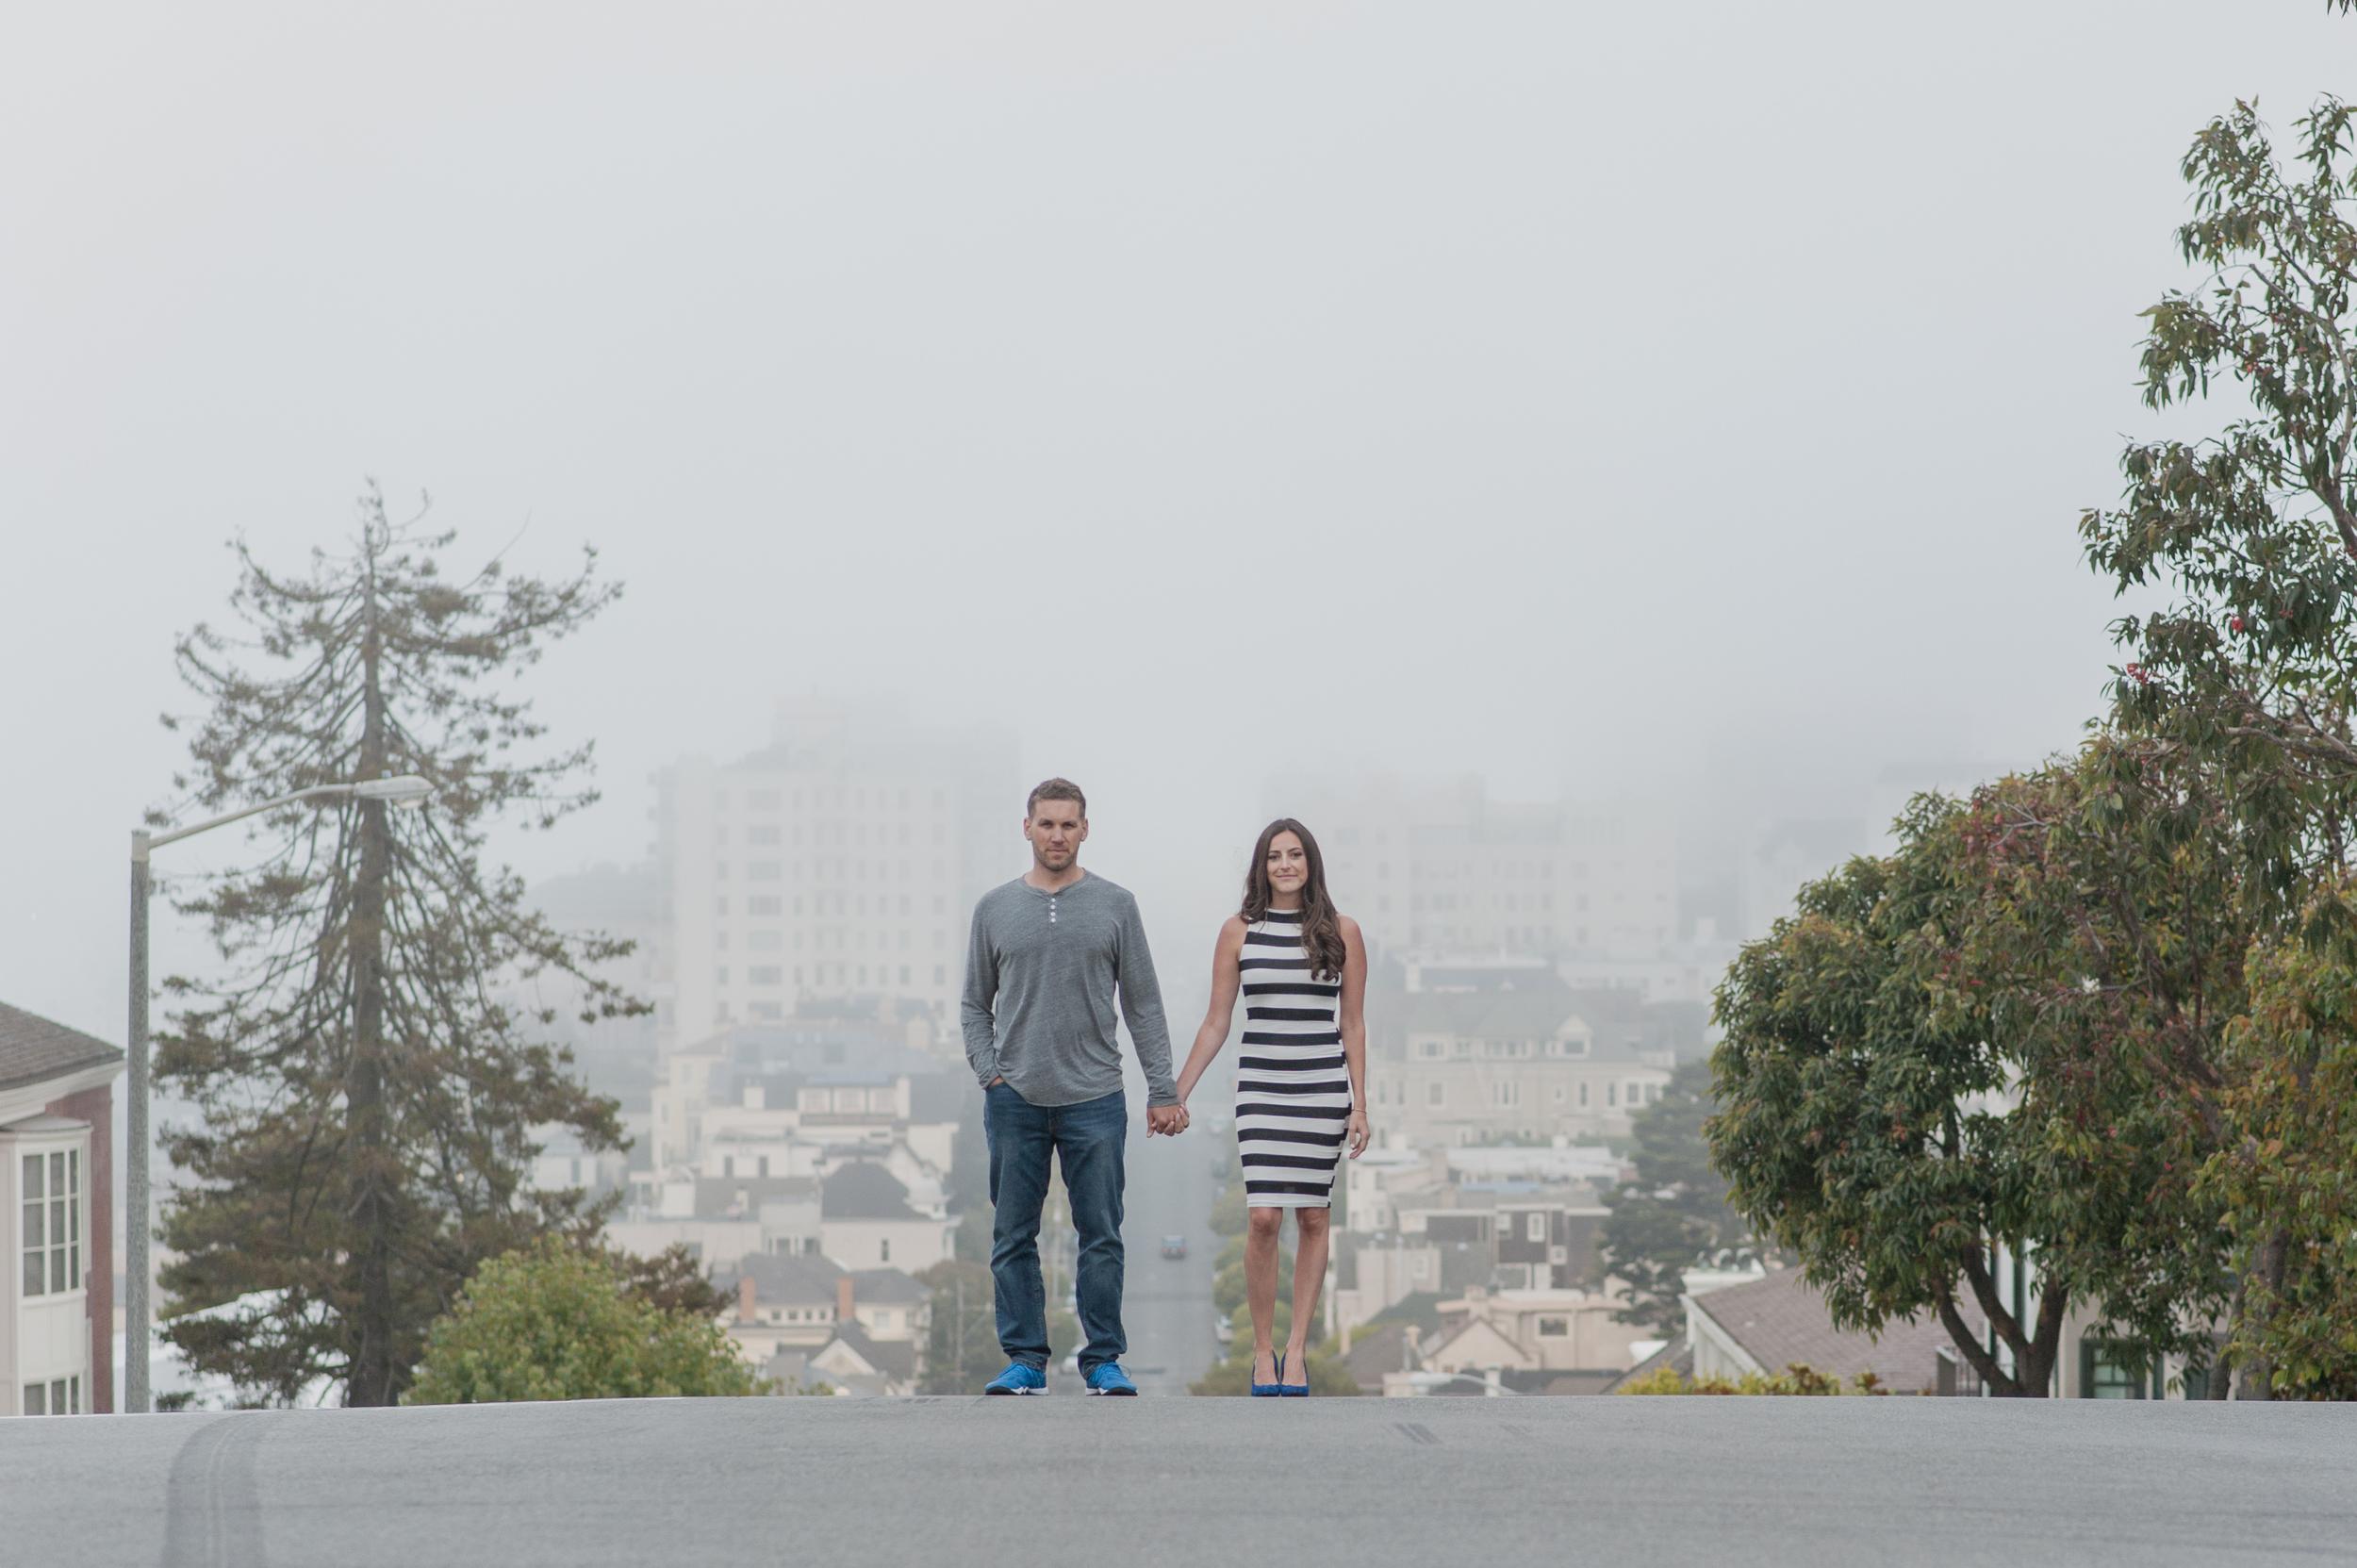 010-foggy-pacific-heights-san-francisco-engagement-vivianchen.jpg